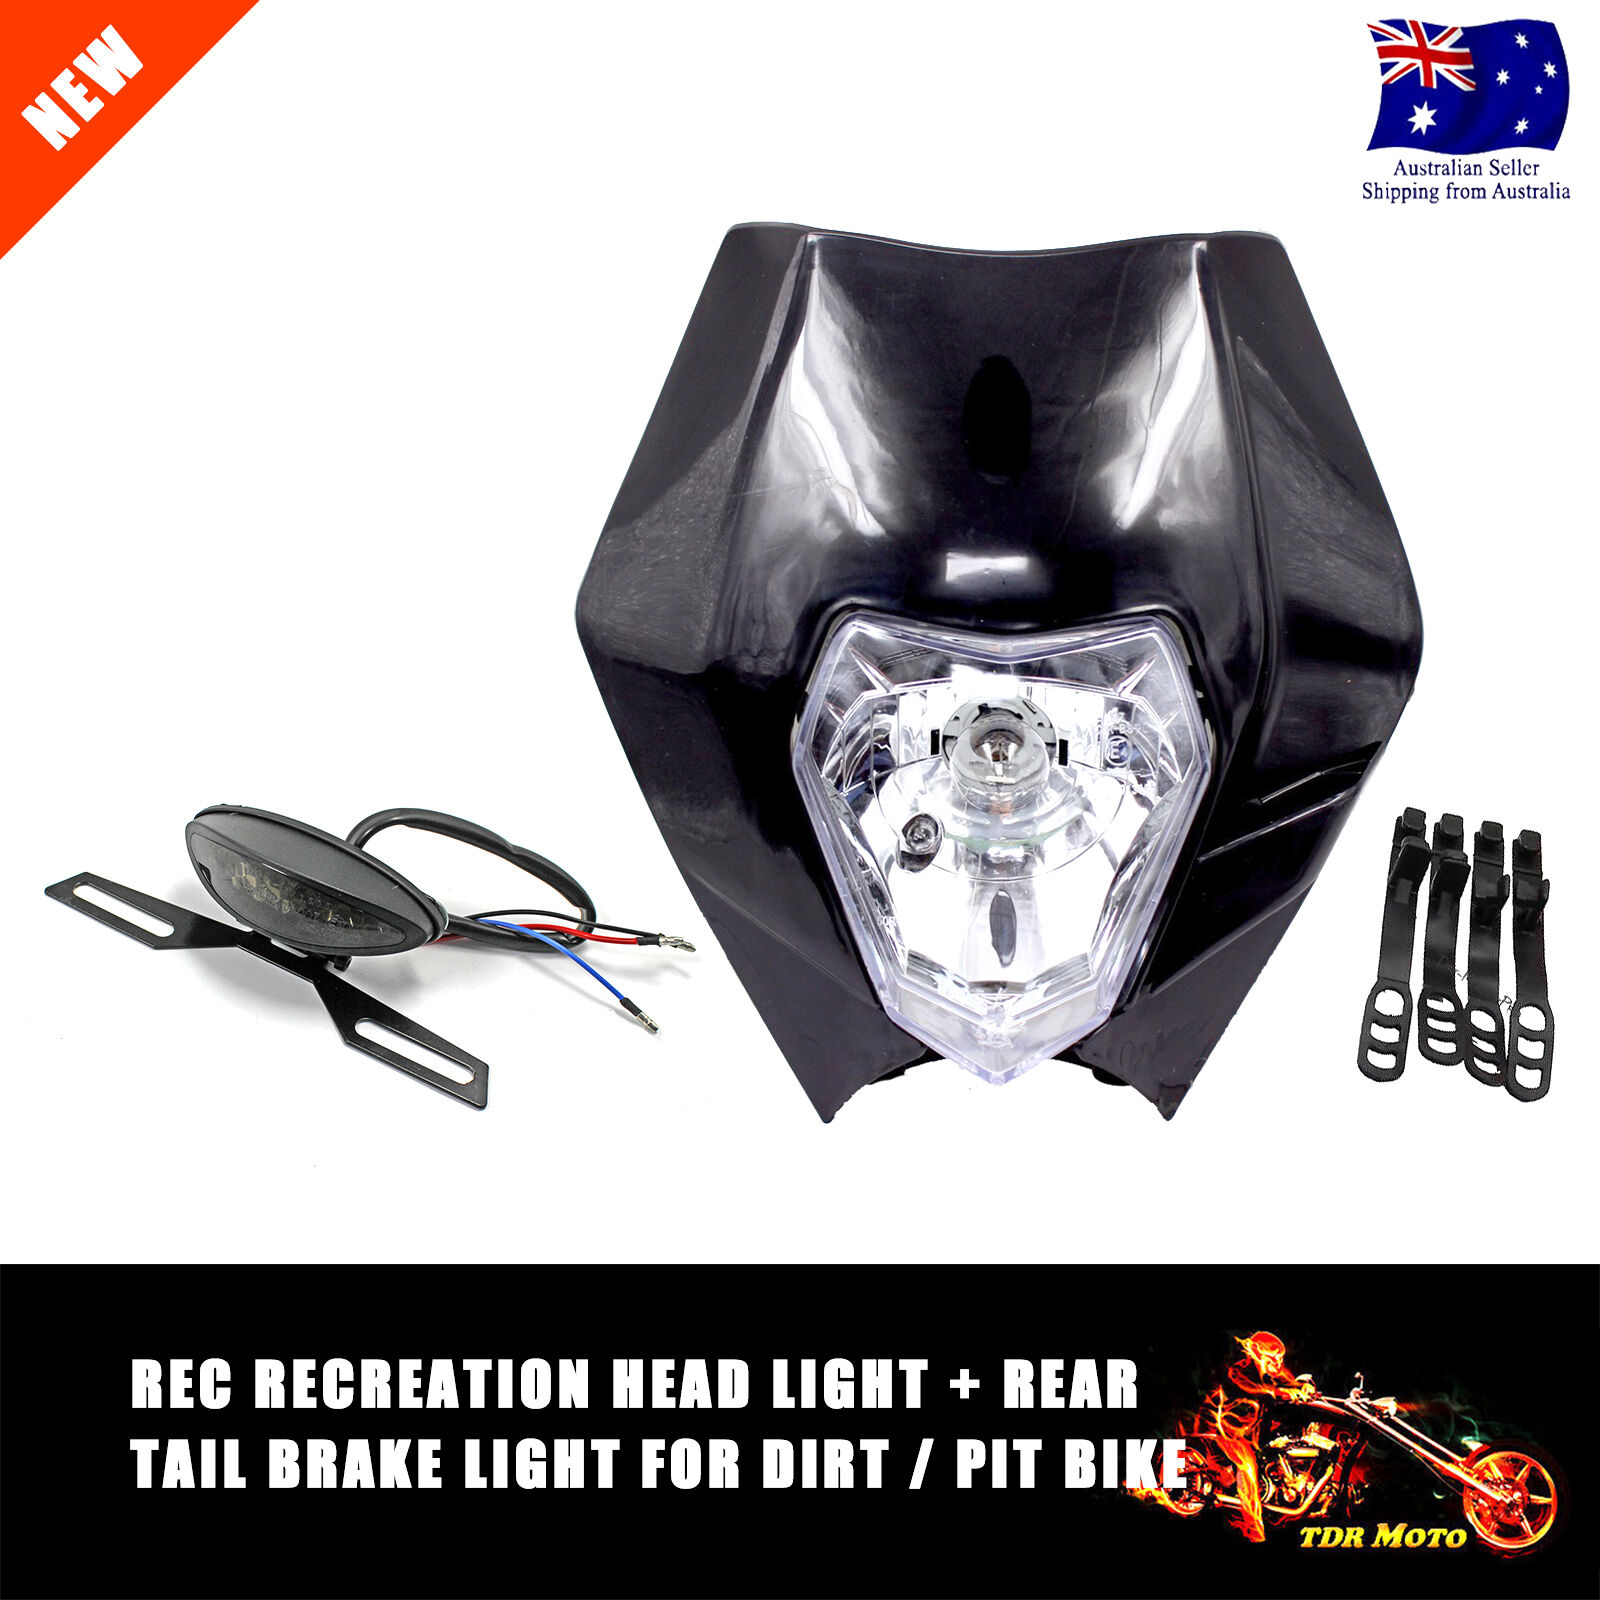 REC REG Lighting Kit for KTM 125 200 250 300 EXC 450 400 RACING ENDURO MX BIKE